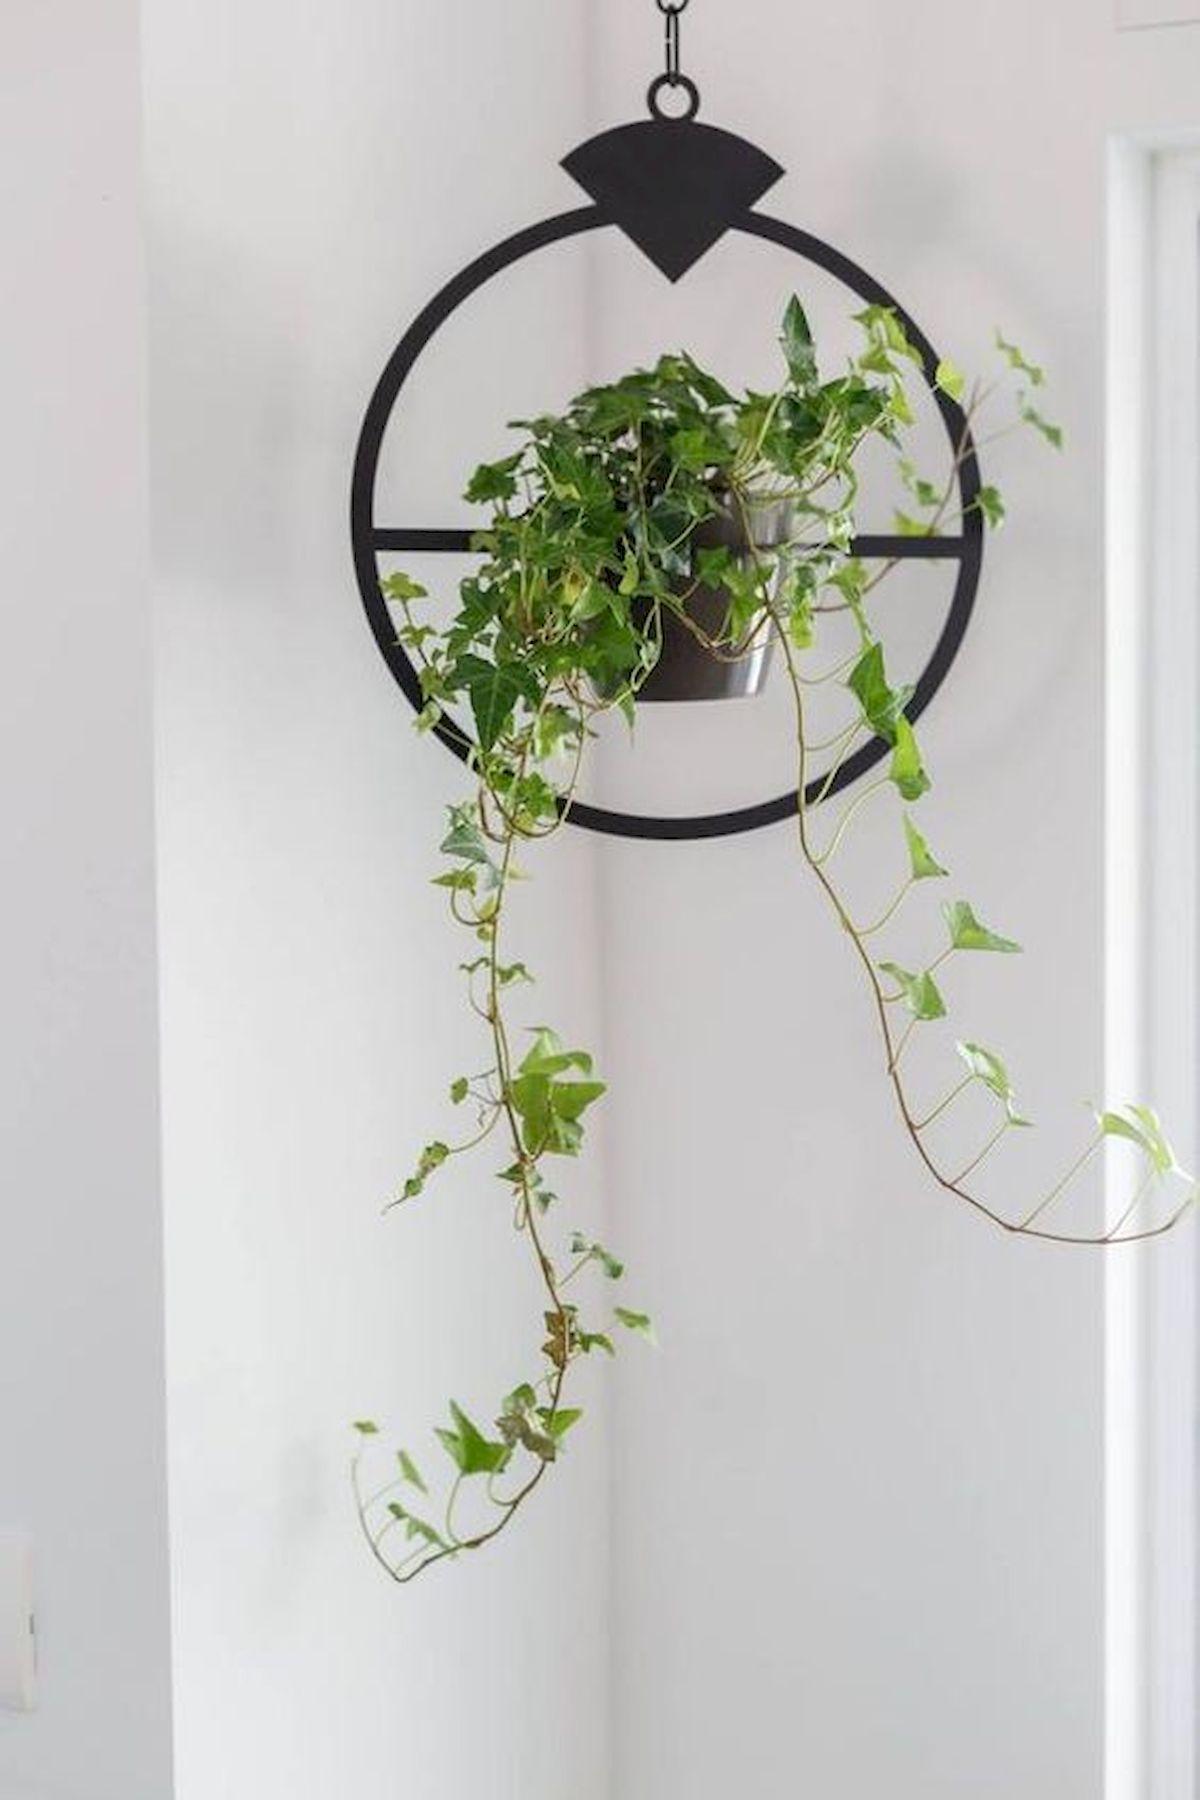 50 Stunning DIY Home Decor Ideas Dollar Store (9)